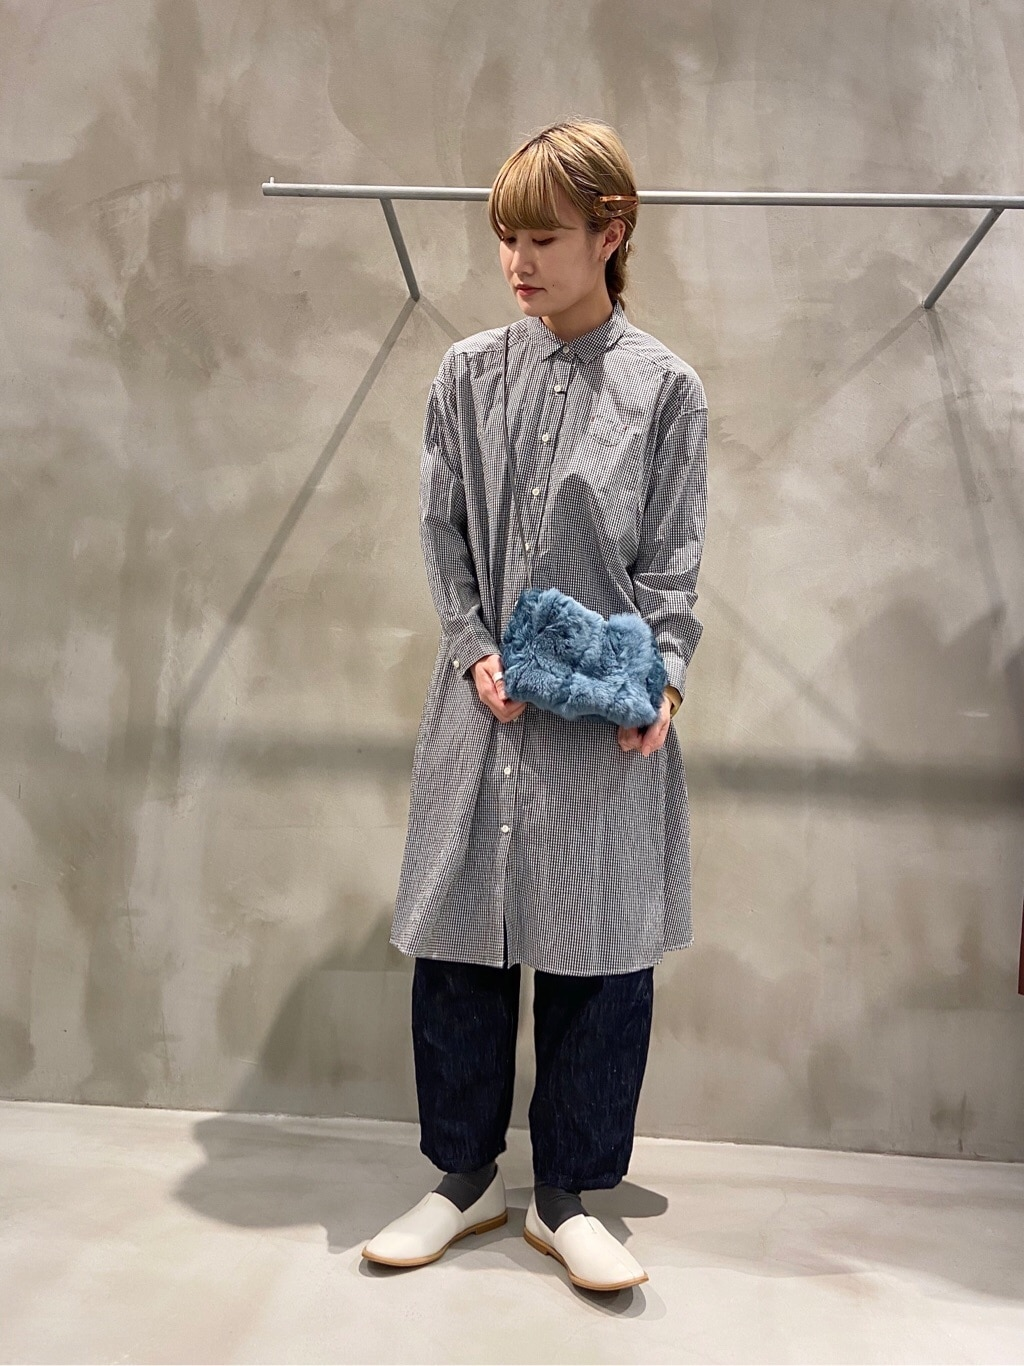 bulle de savon 渋谷スクランブルスクエア 身長:160cm 2020.09.12